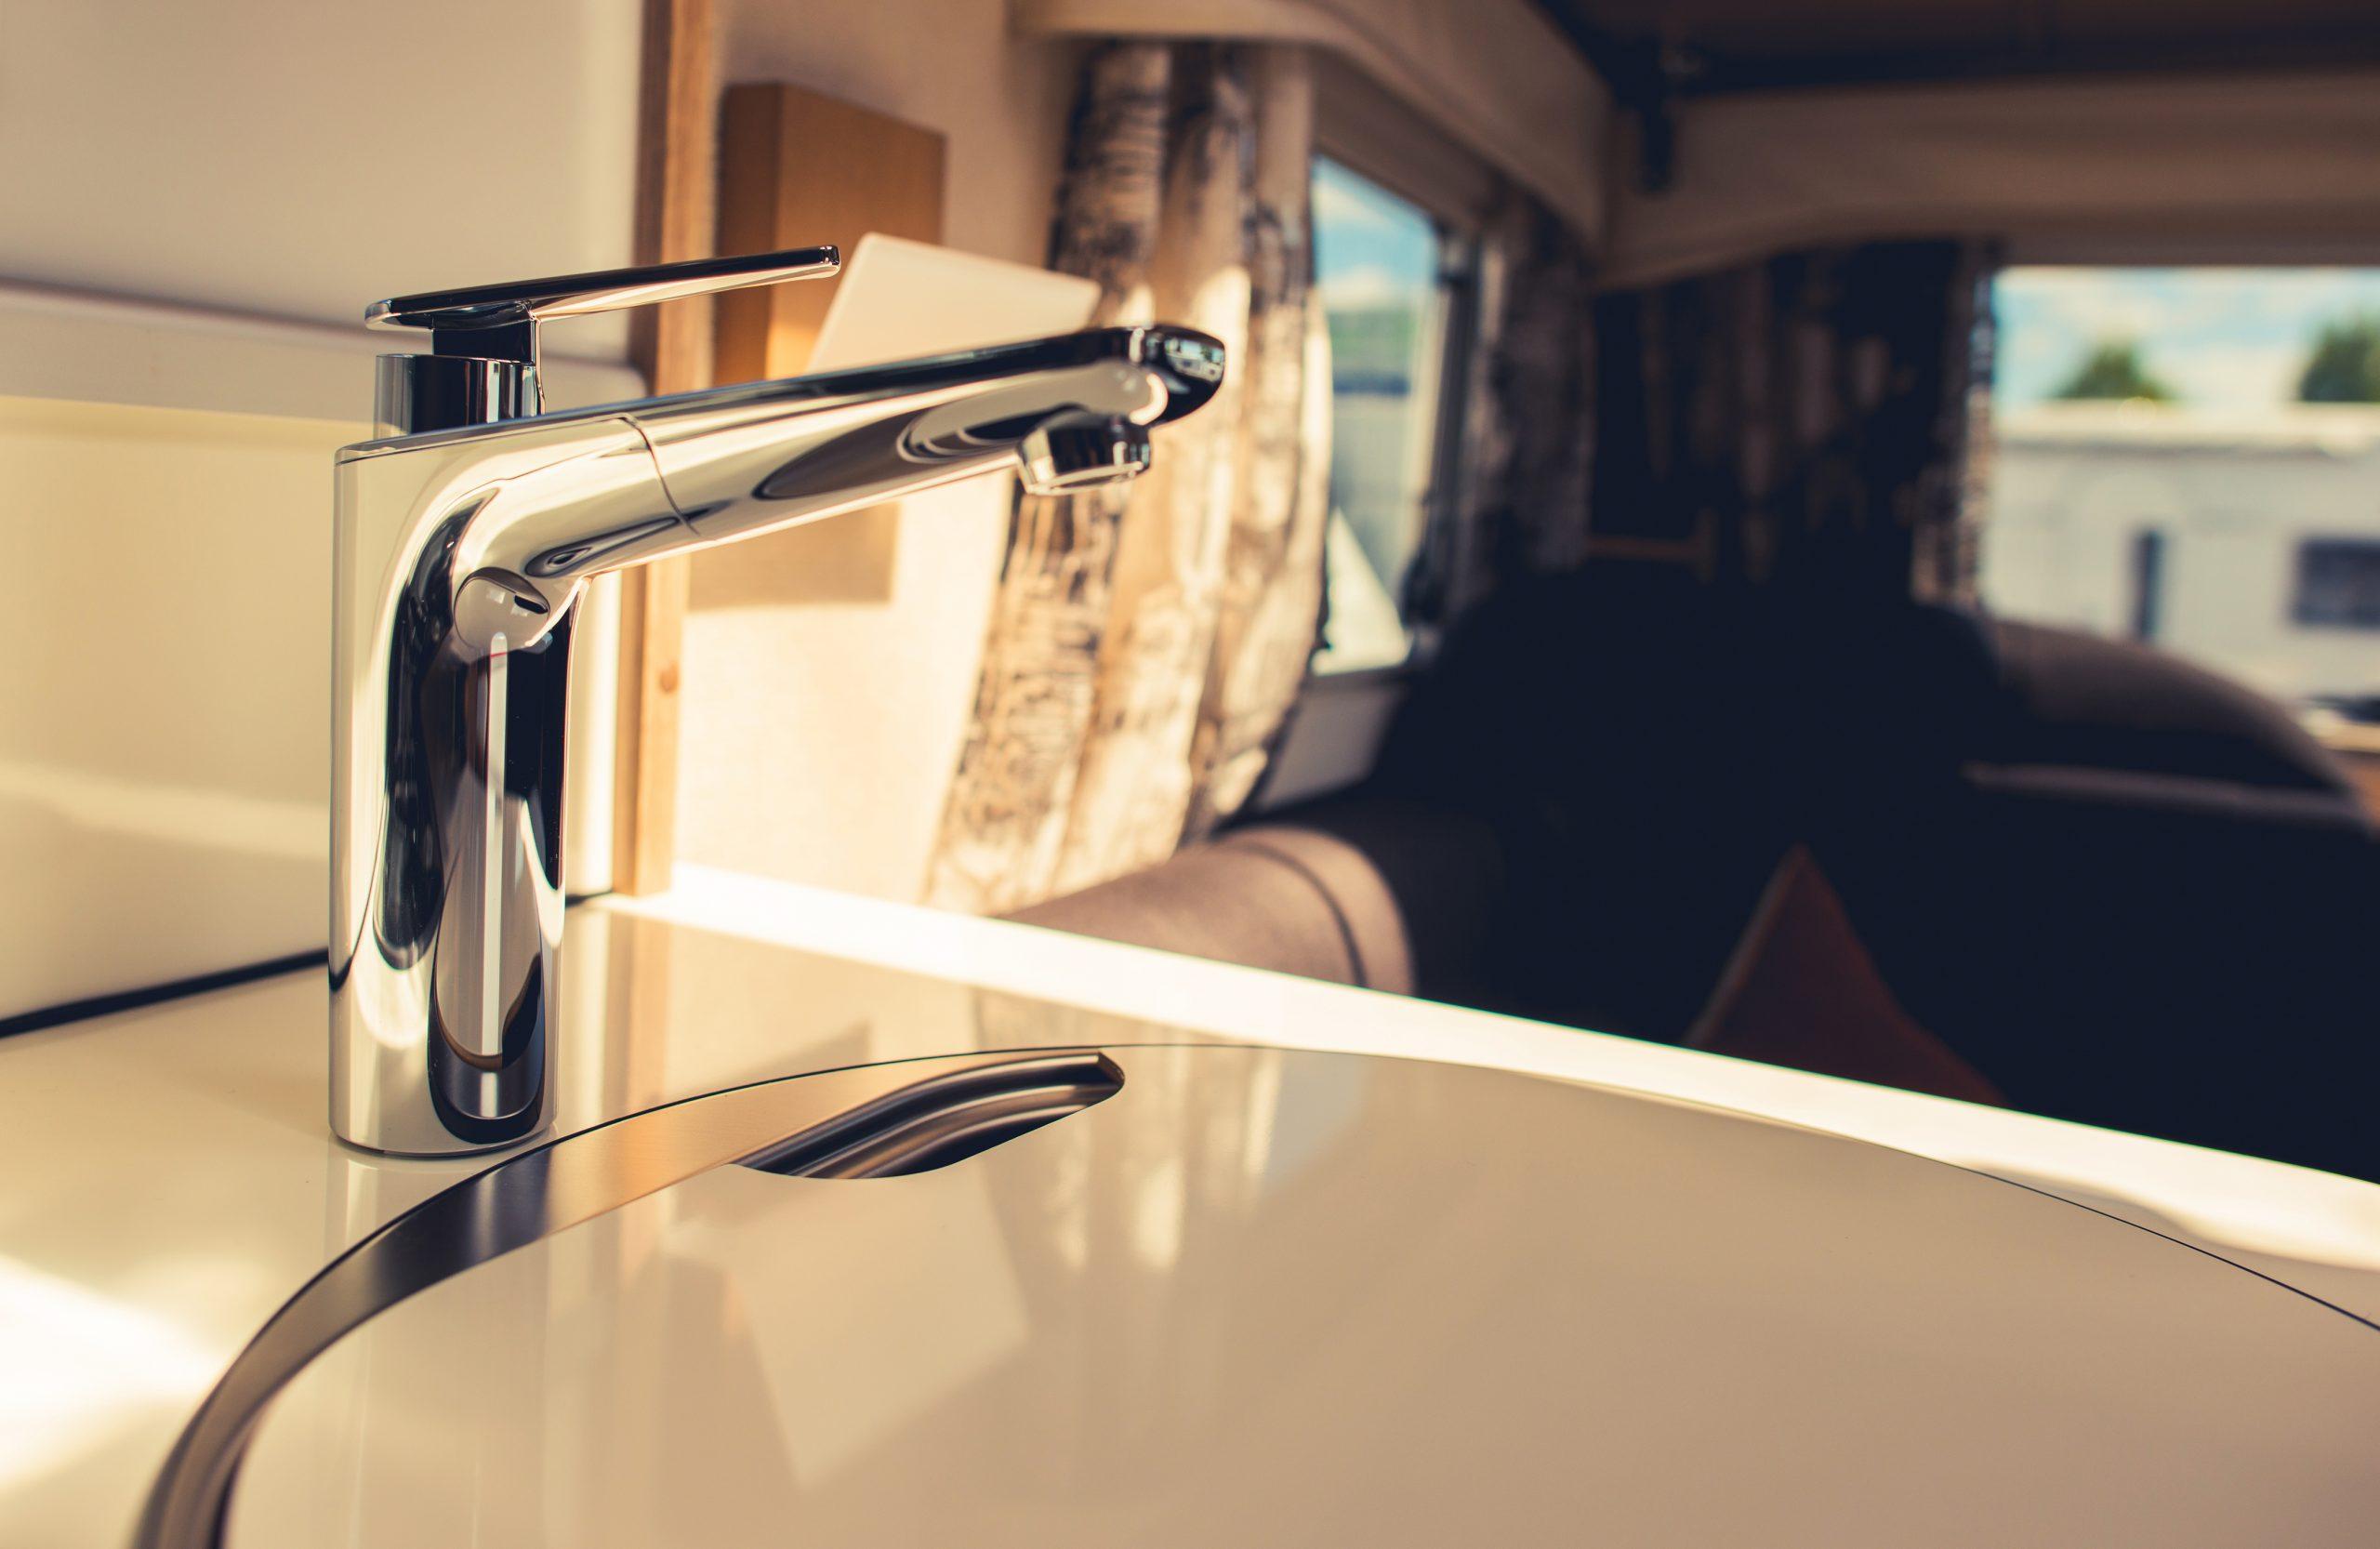 Motorhome Sink Faucet